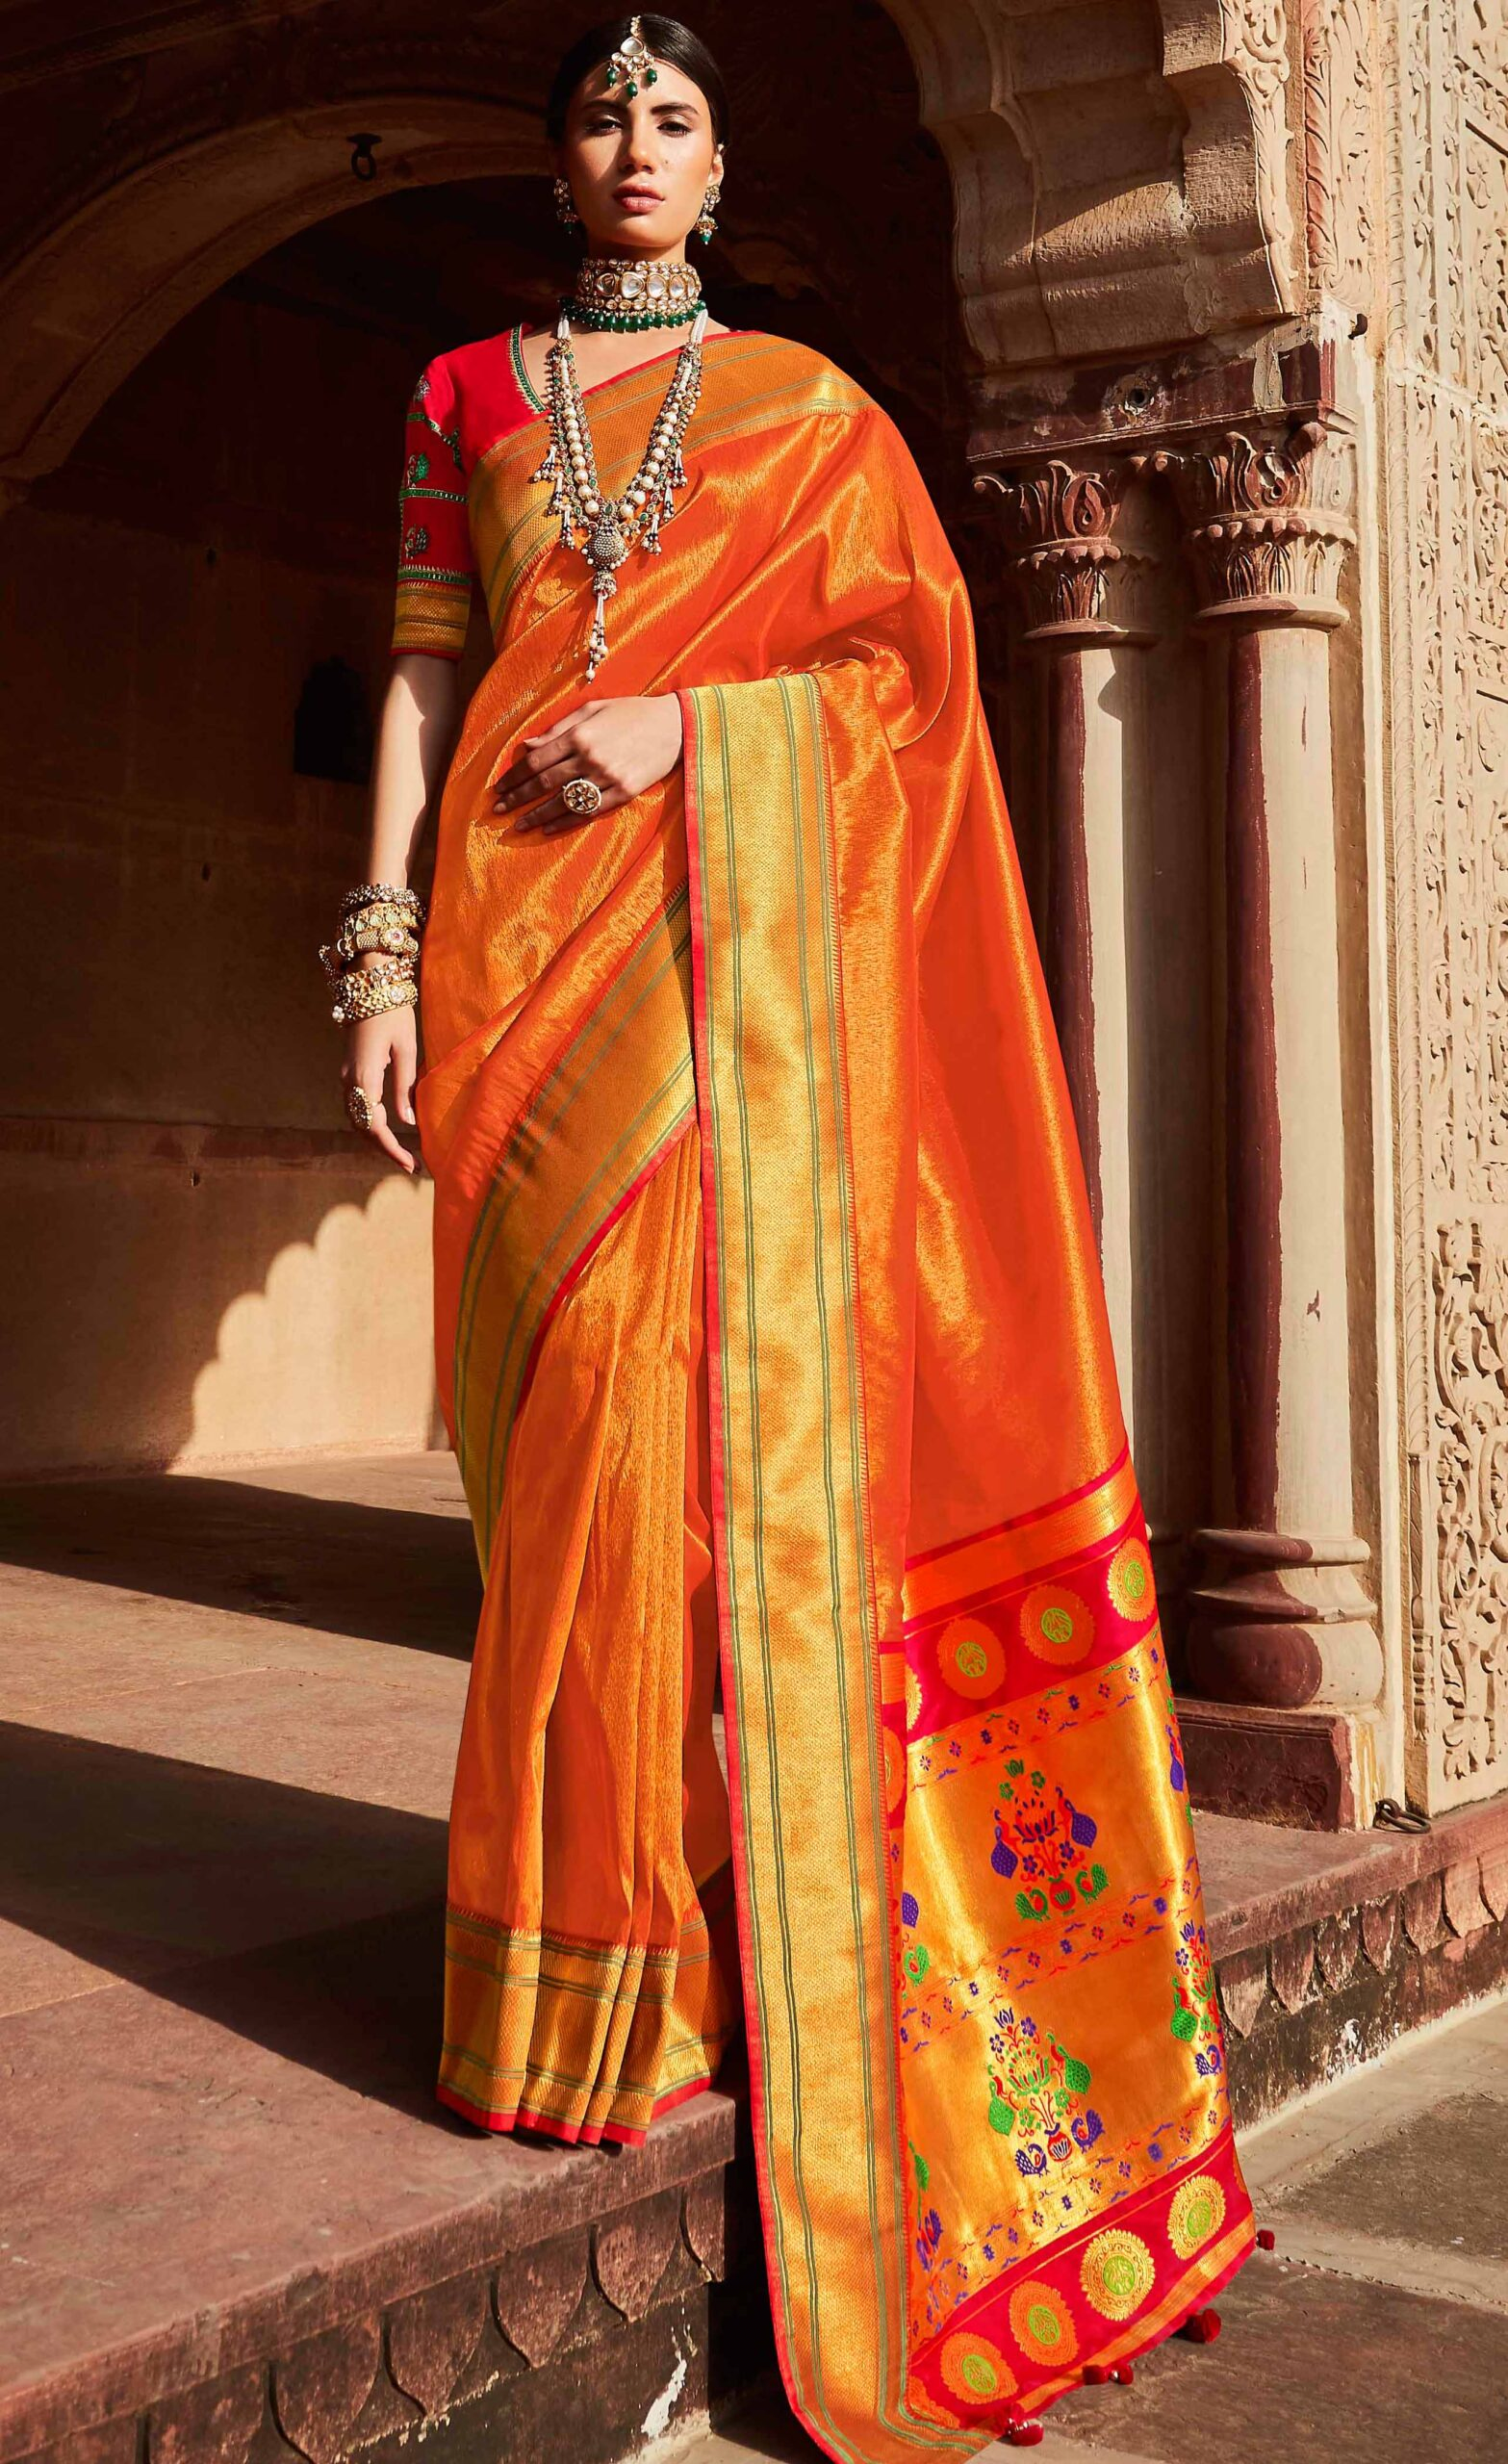 Latest Wedding Banarasi Saree for New Bride